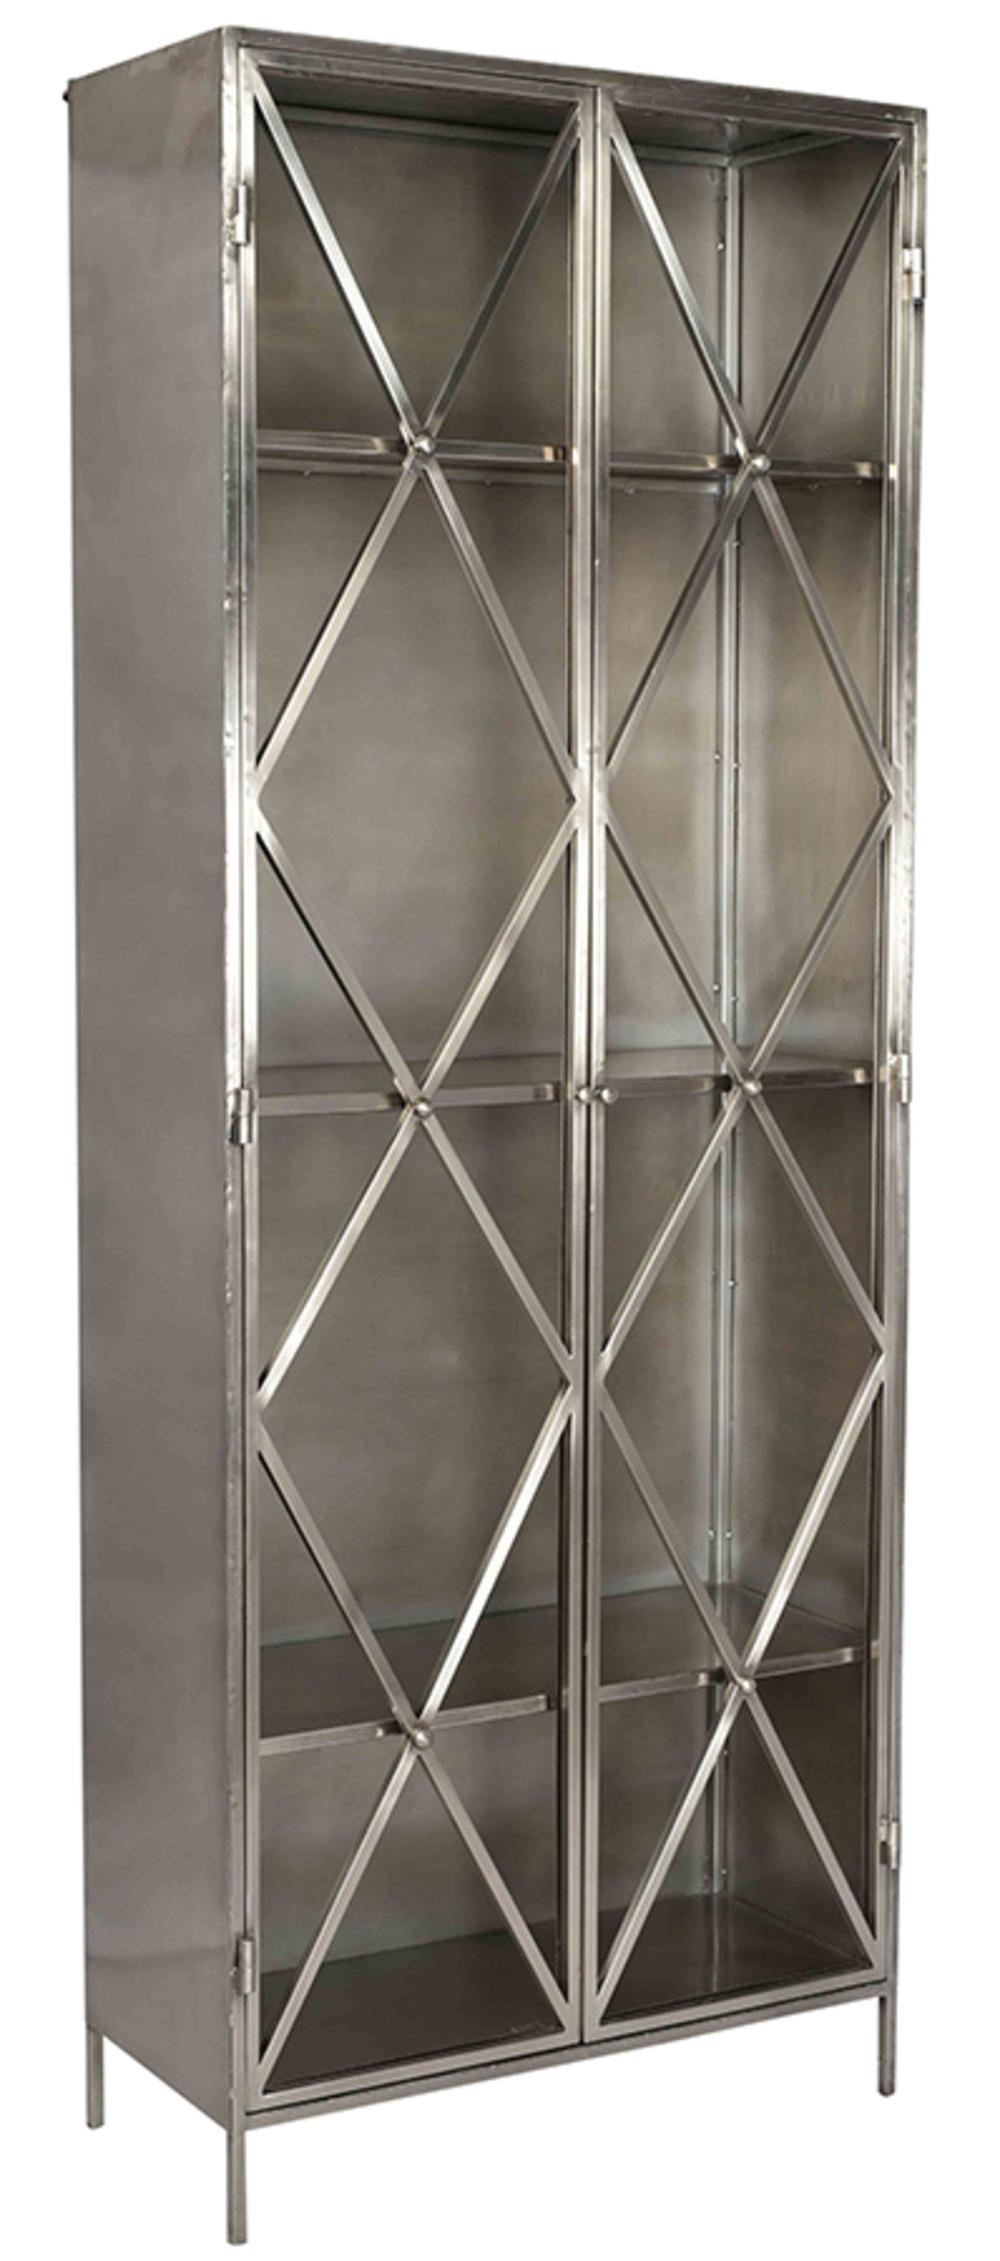 Dovetail Furniture - Rexar Cabinet